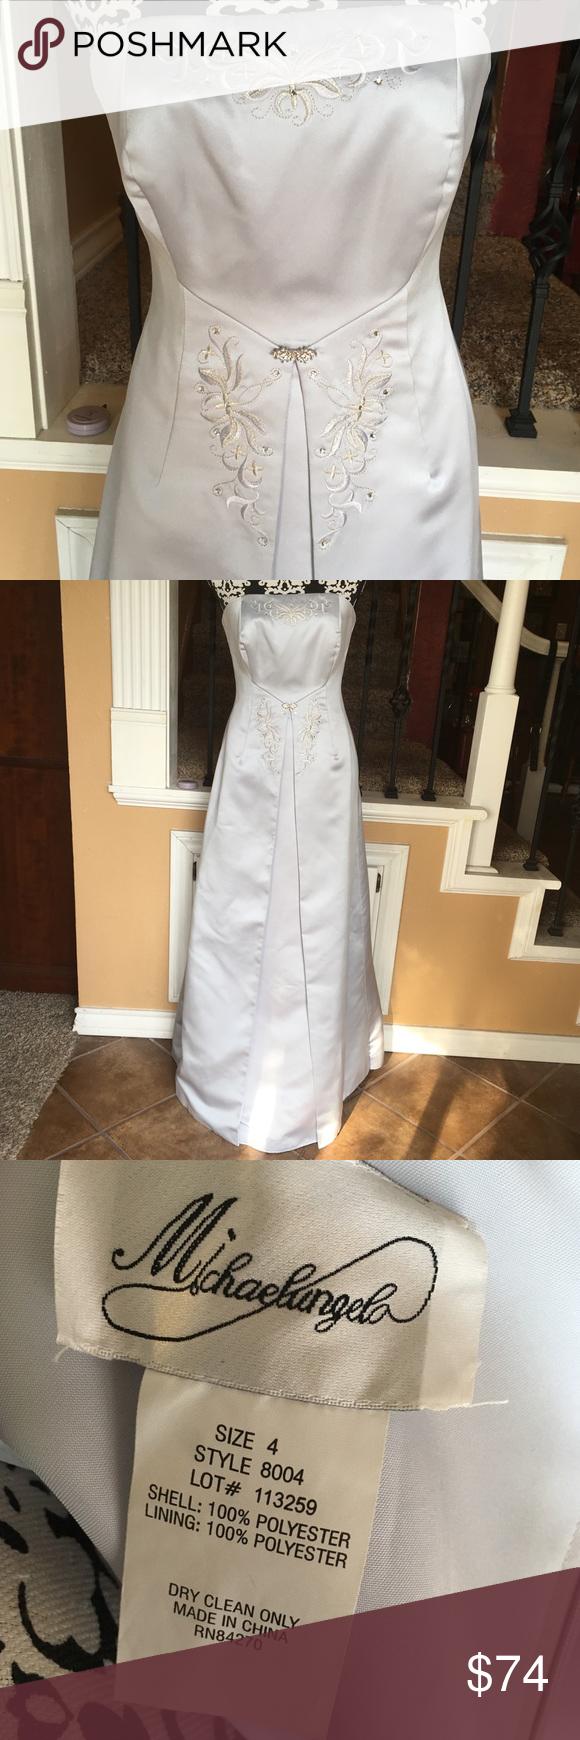 Michelangelo S silver weddingbrides maid dress  My Posh Closet